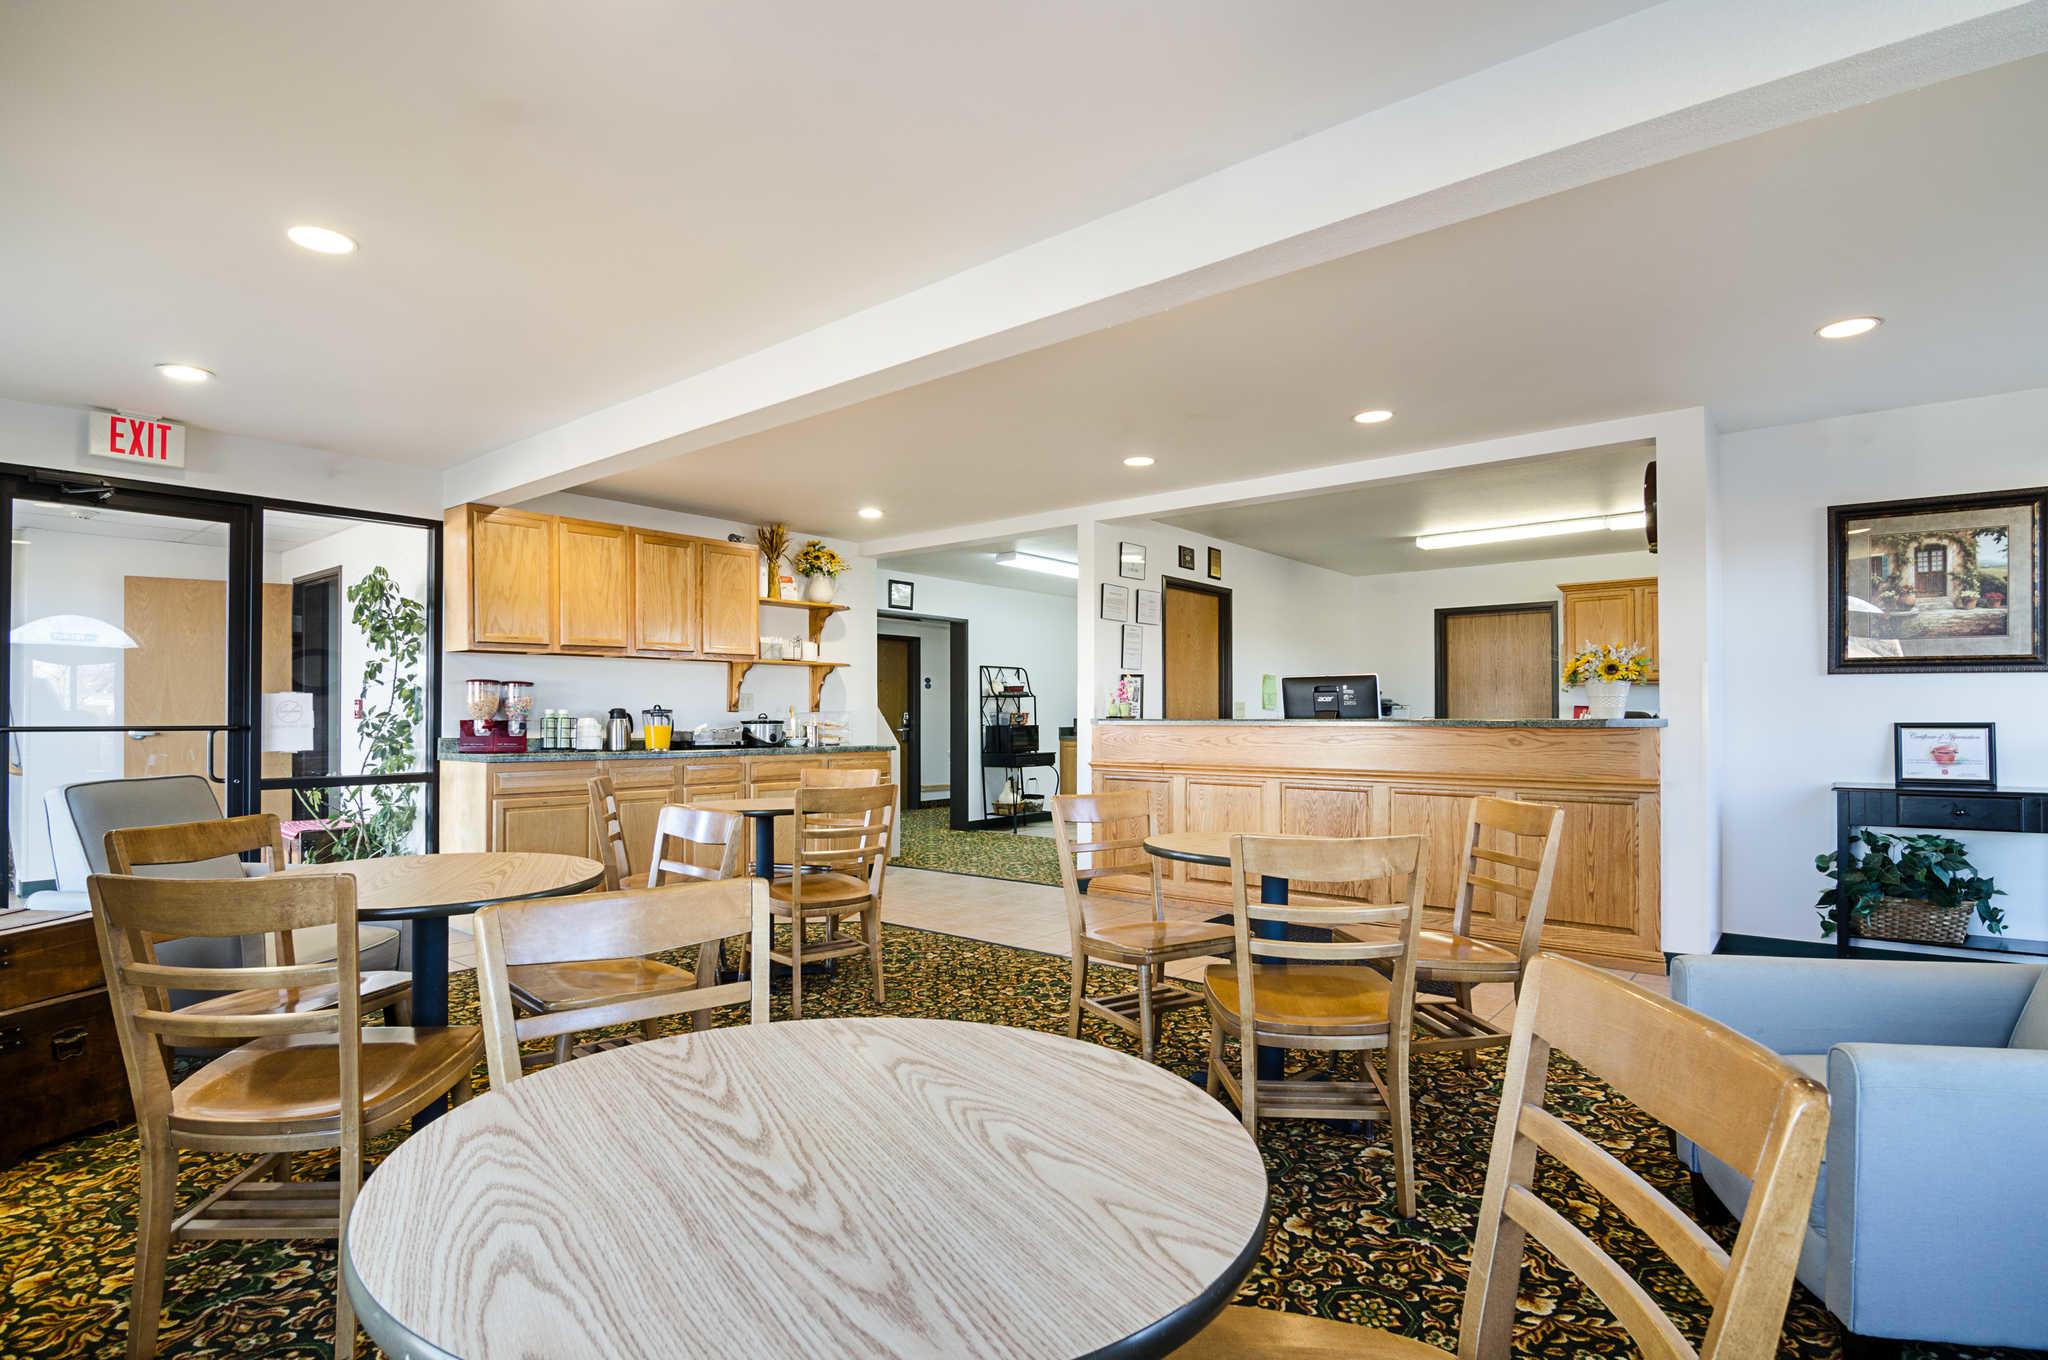 Rodeway Inn image 29